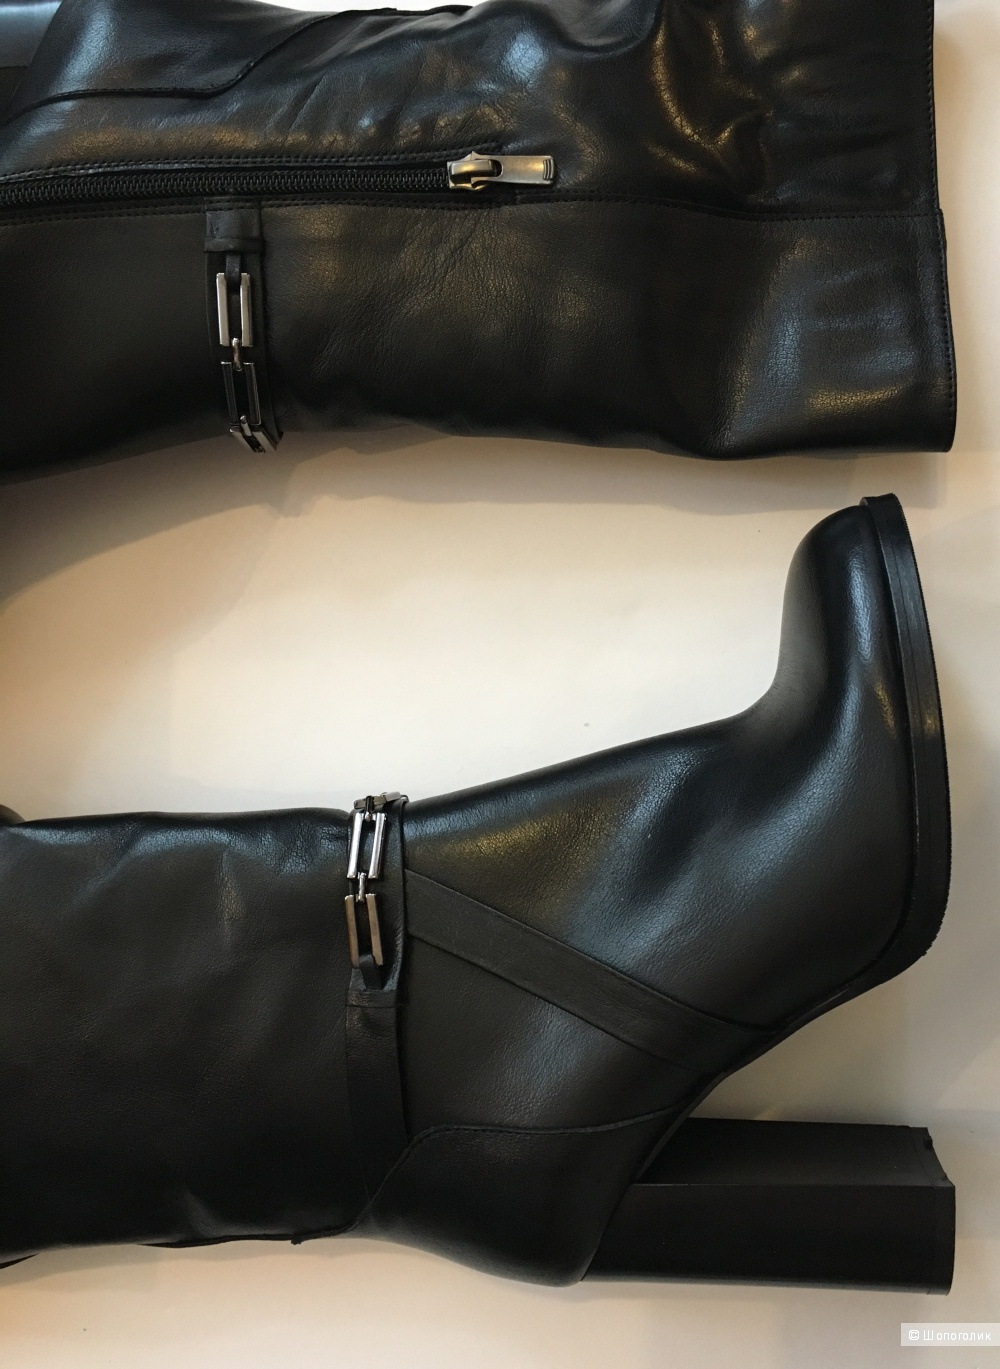 Сапоги Lottini, 37 размер